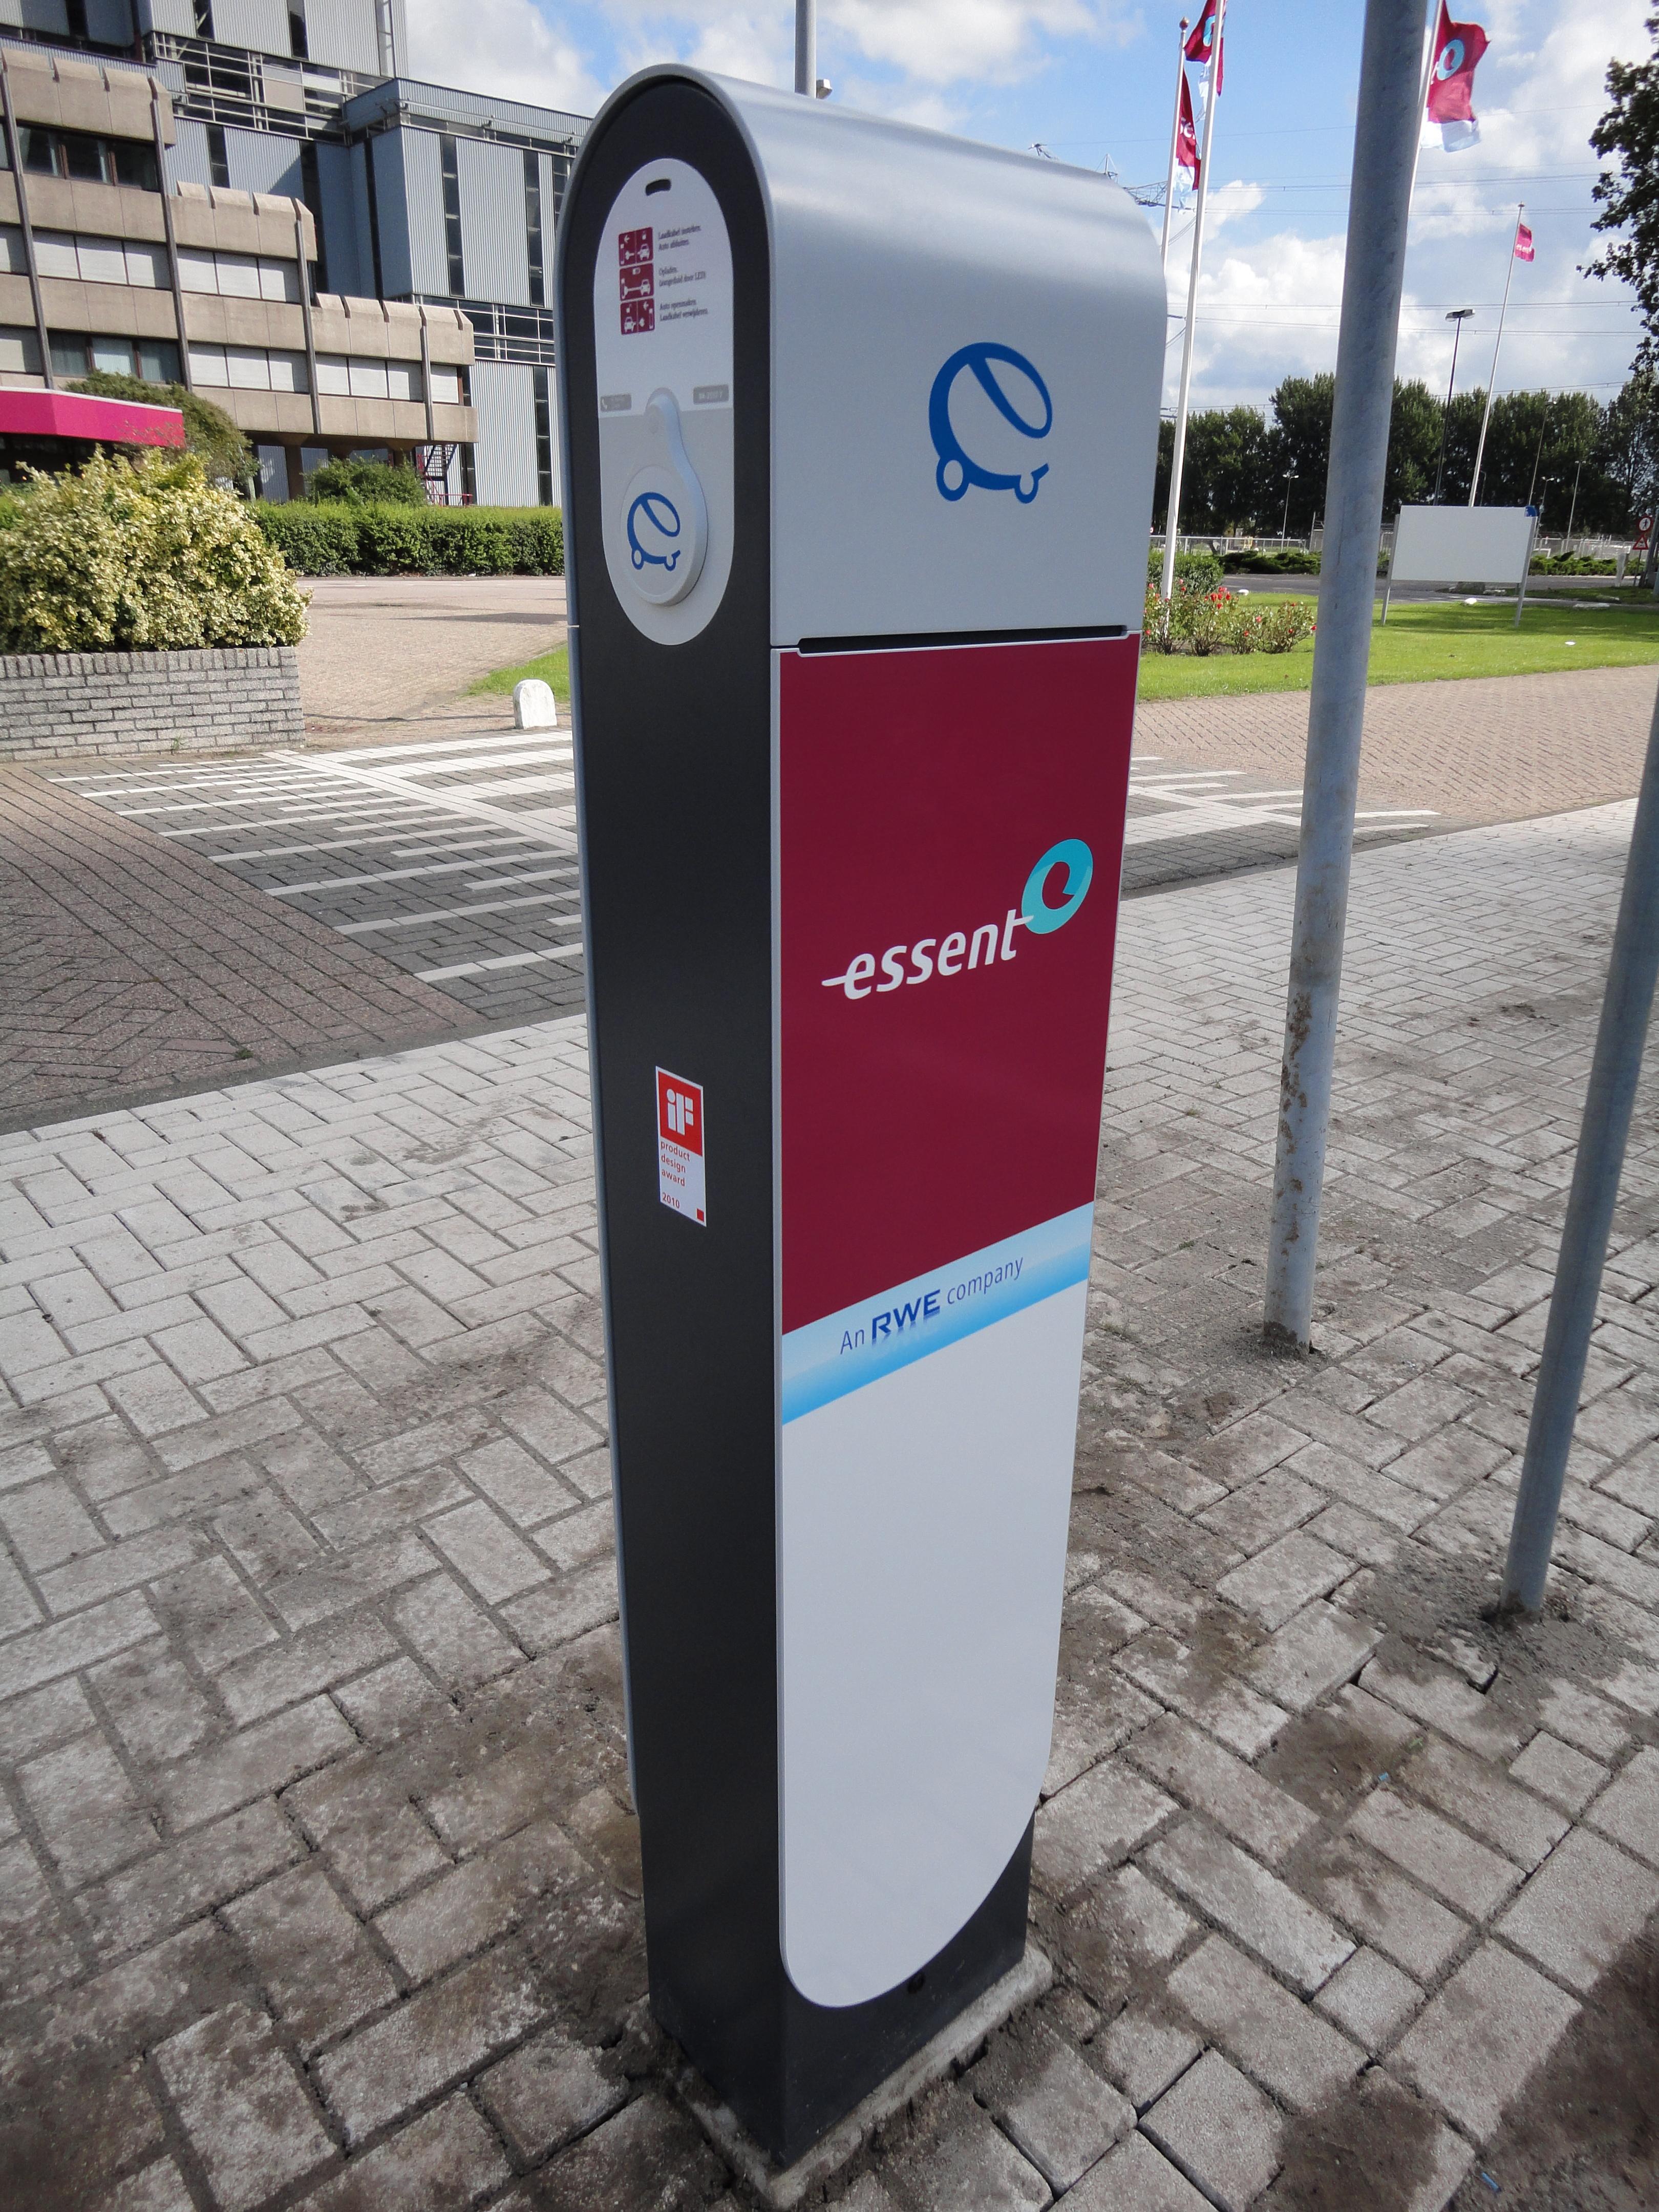 File:Laadpaal elektrische auto.jpg - Wikimedia Commons